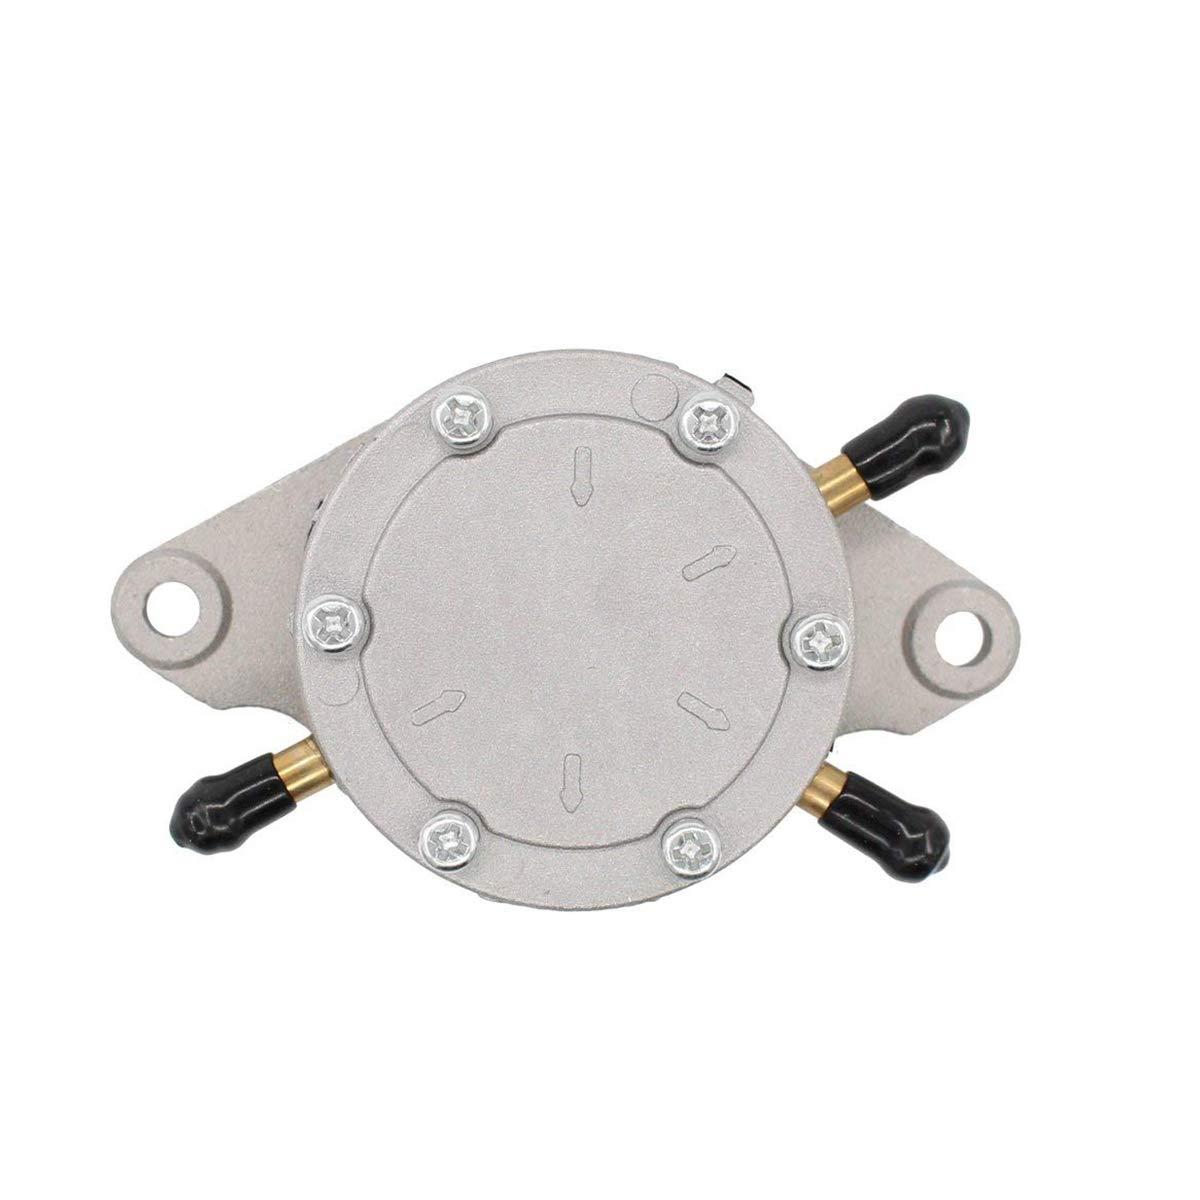 DF52-176 Fuel Pump Round Bracket for Dual Mount Mount 2 Outlet 35 LPH DF52-176